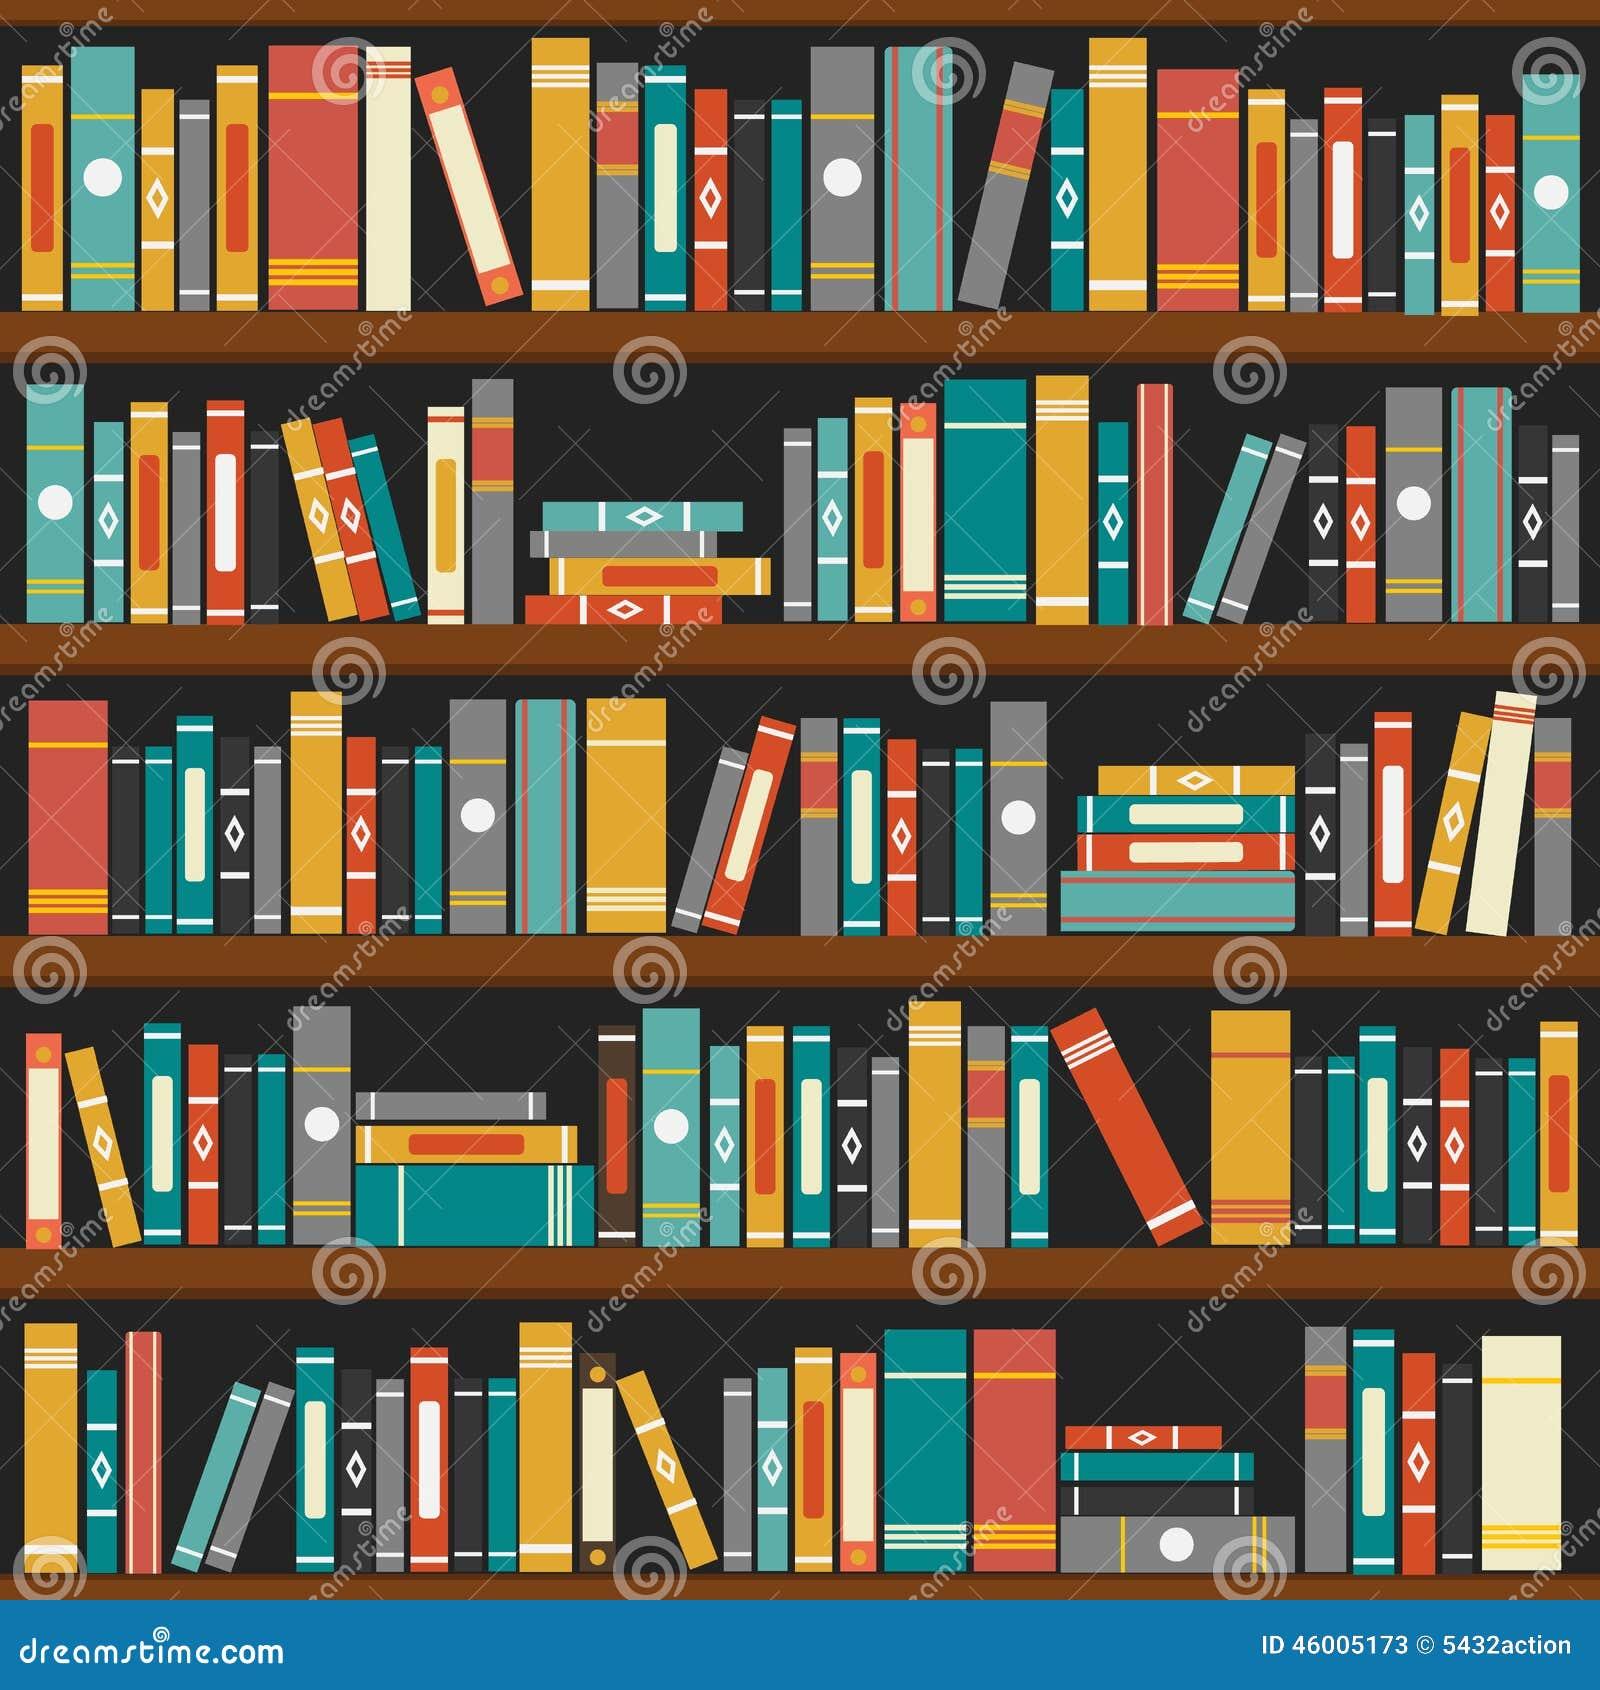 vecteur de fond d 39 tag res livres de biblioth que illustration de vecteur image 46005173. Black Bedroom Furniture Sets. Home Design Ideas